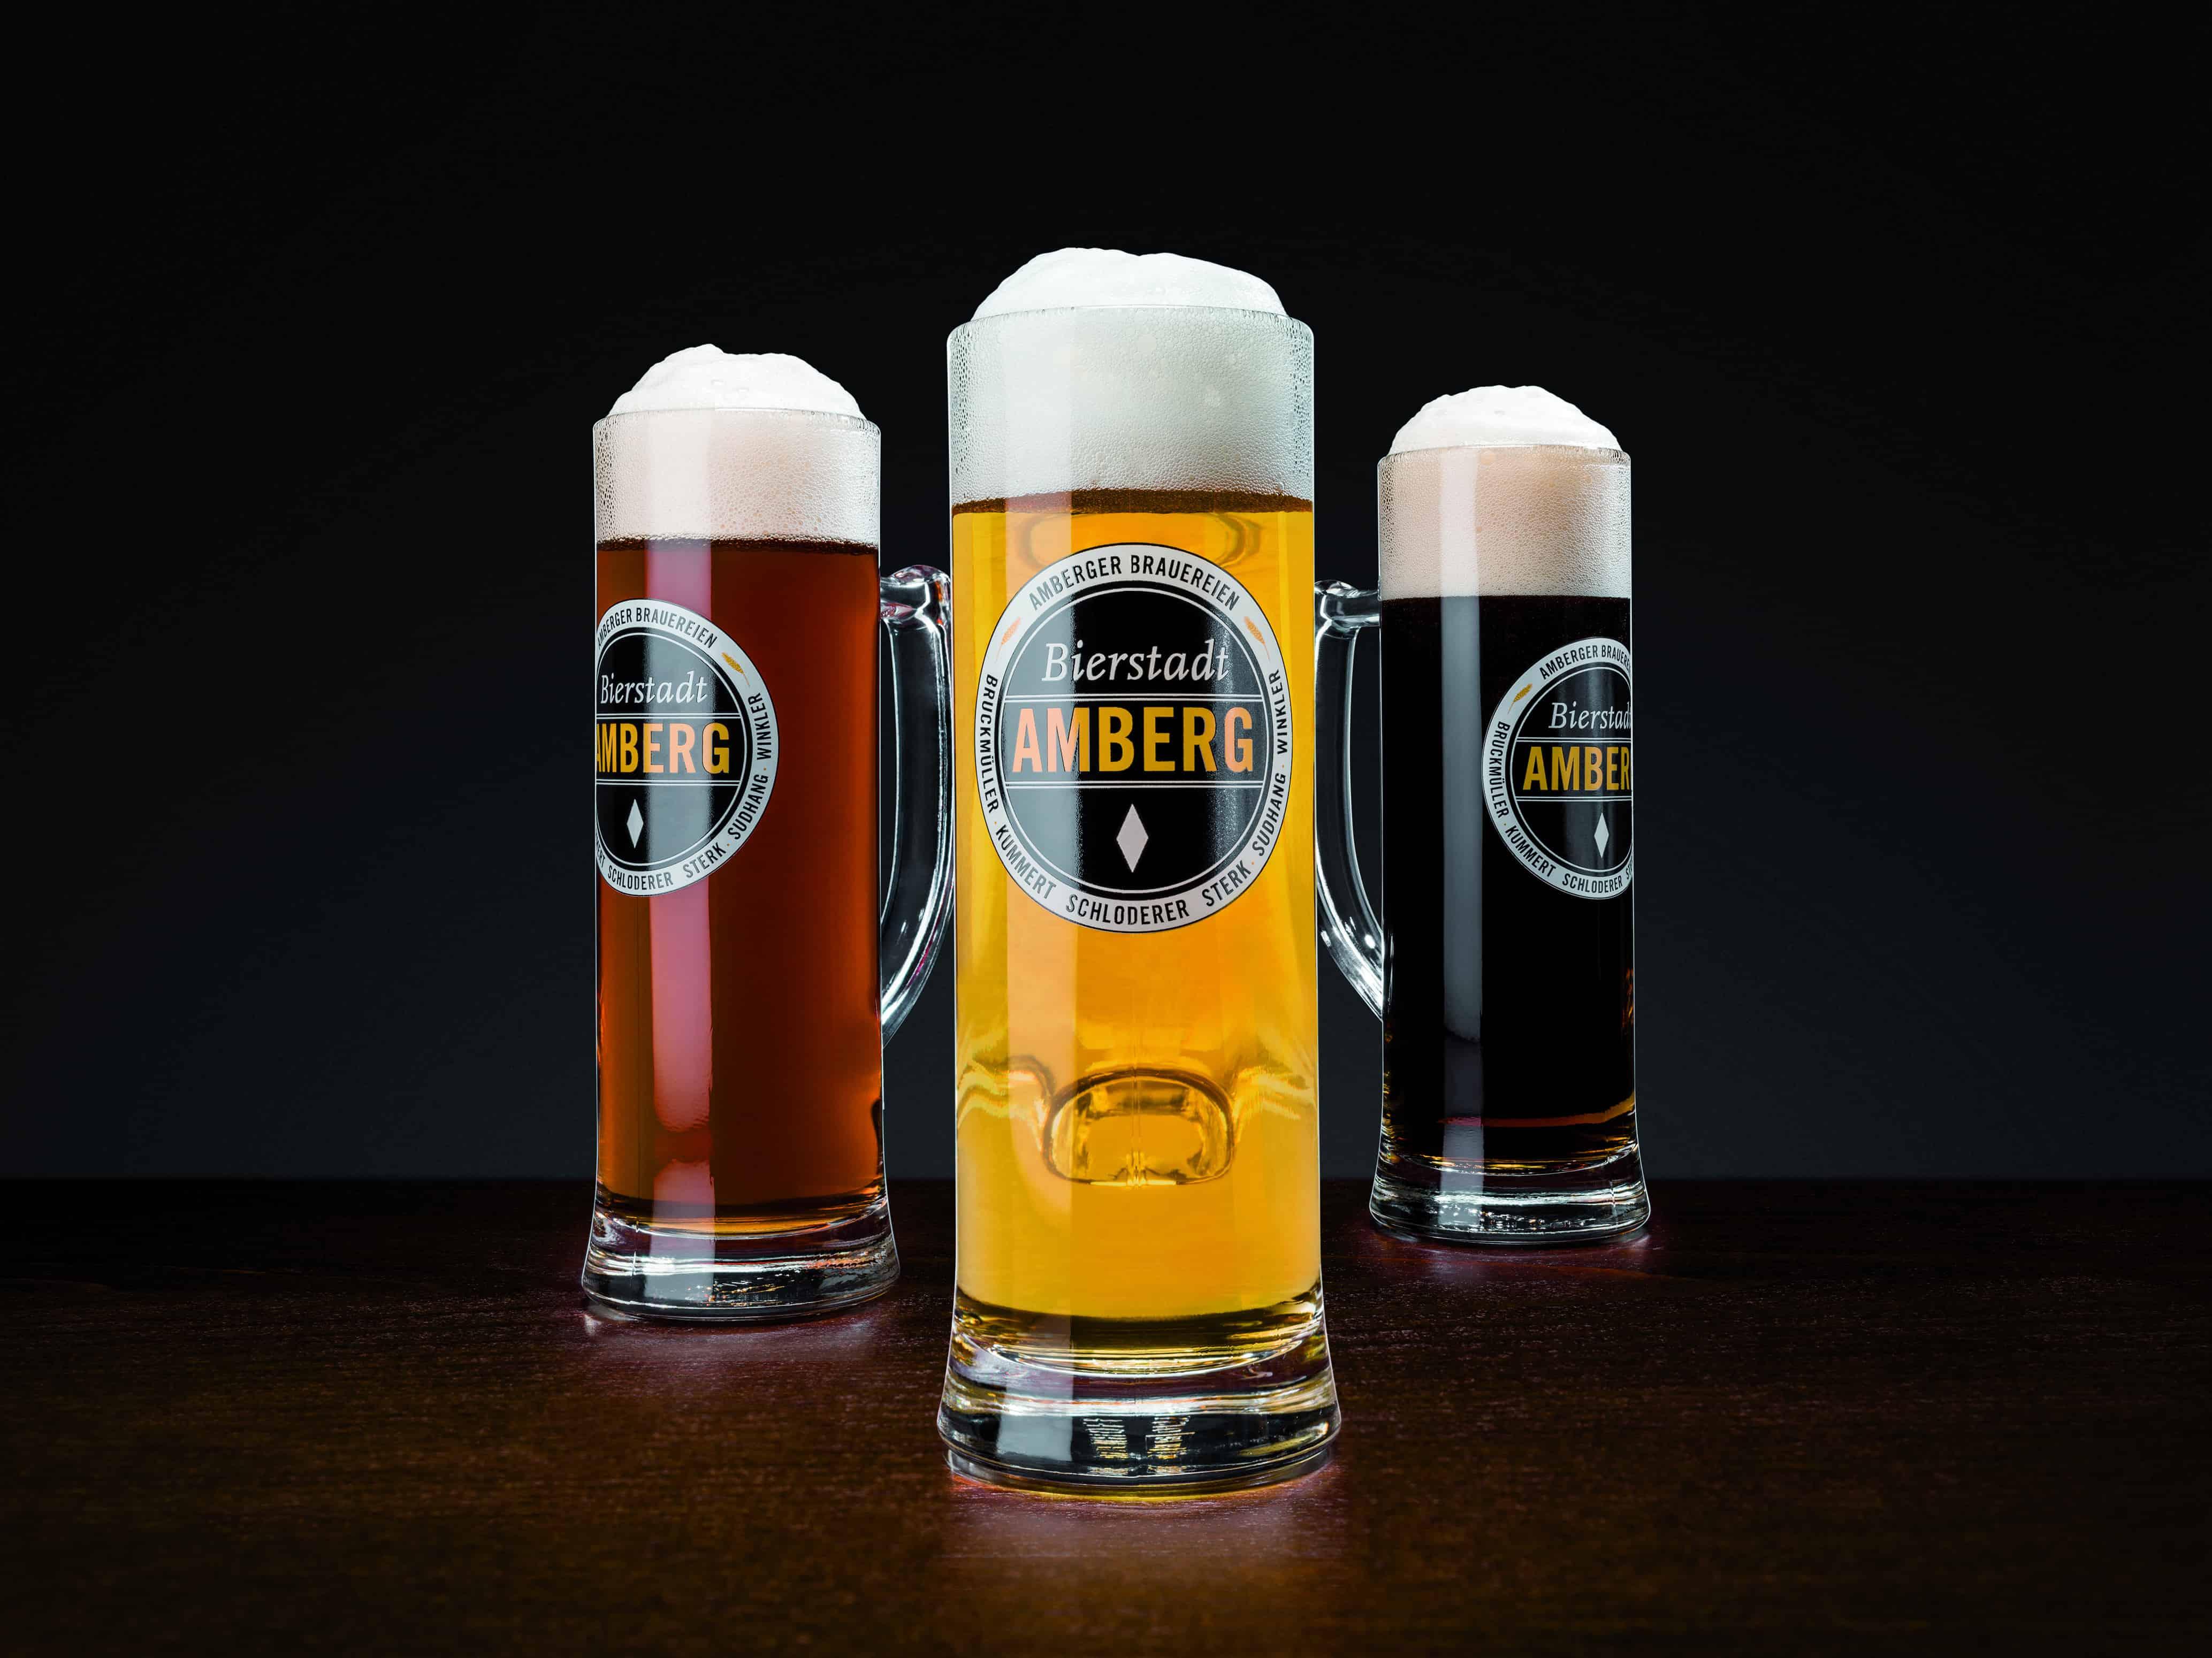 500 Jahre Brauerei-Tradition in Amberg